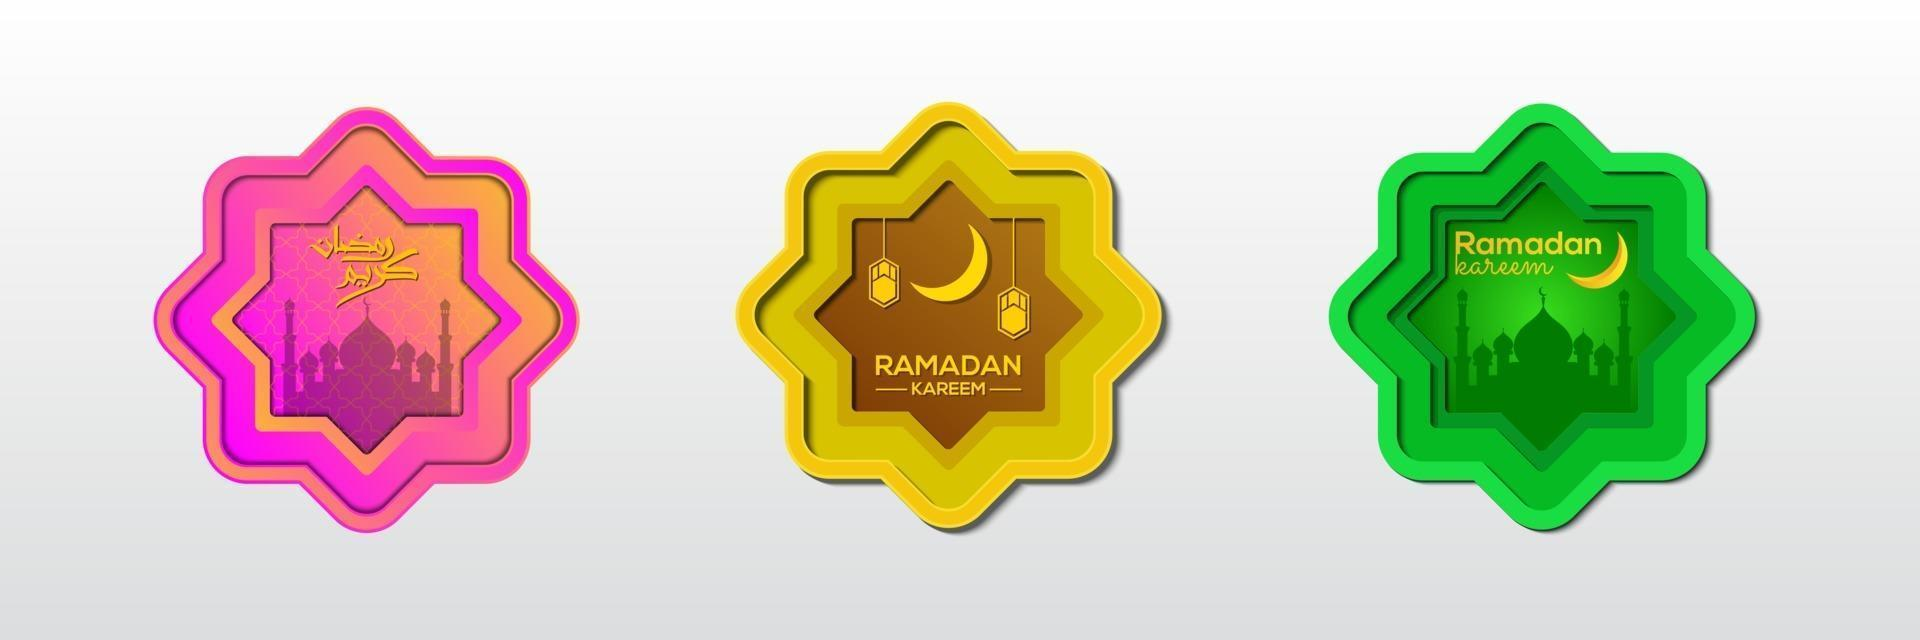 Sammlung von Ramadan Kareem Ornamenten vektor